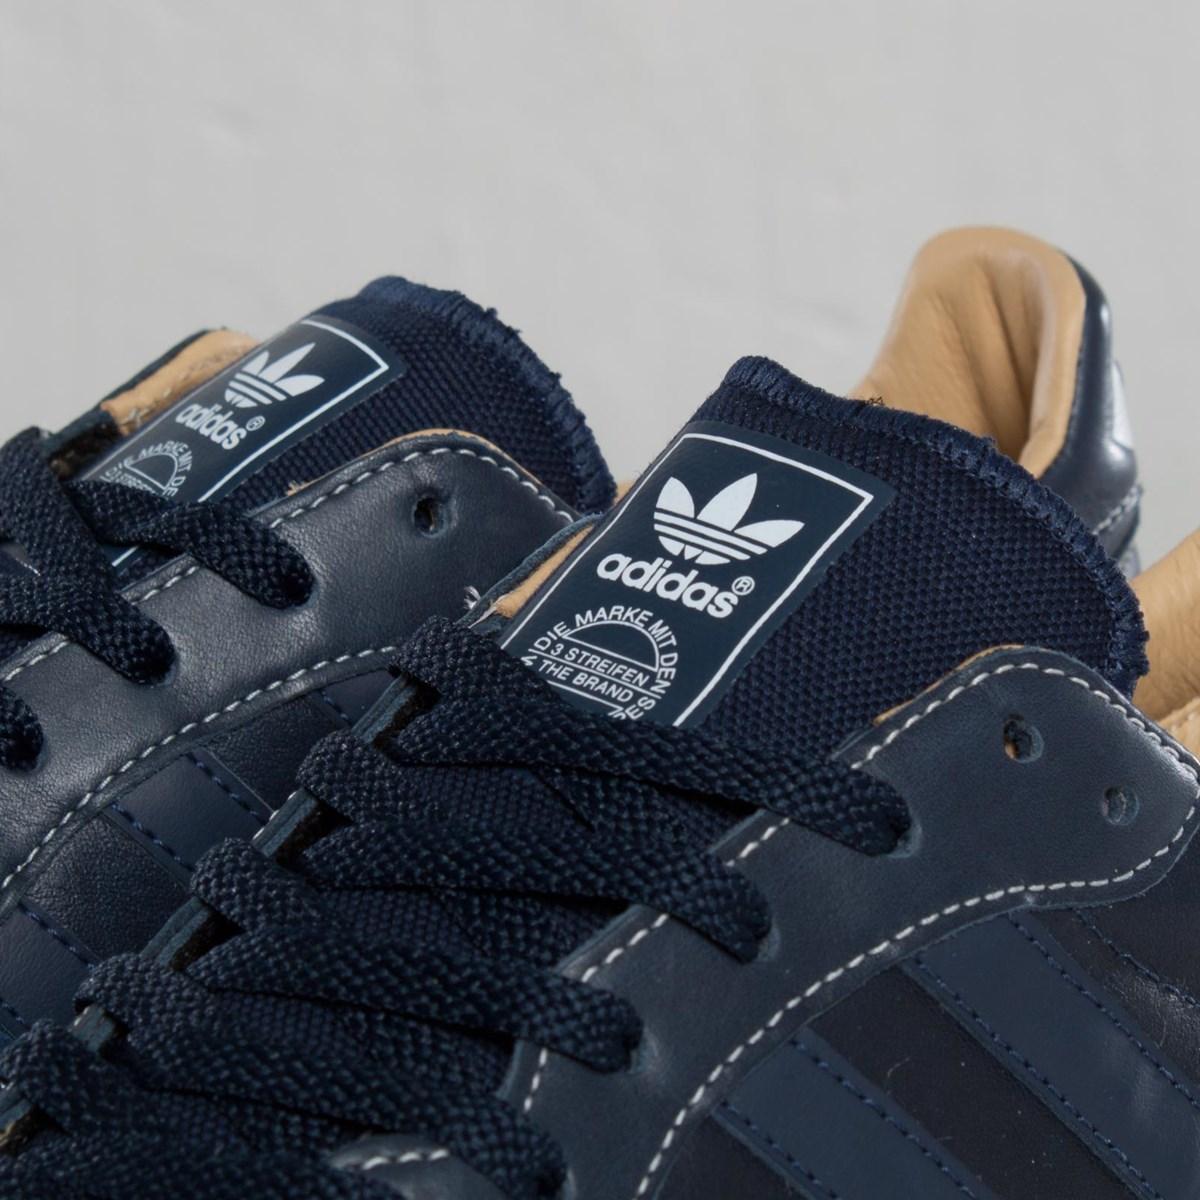 adidas Handball 5 plug 109421 Sneakersnstuff | sneakers